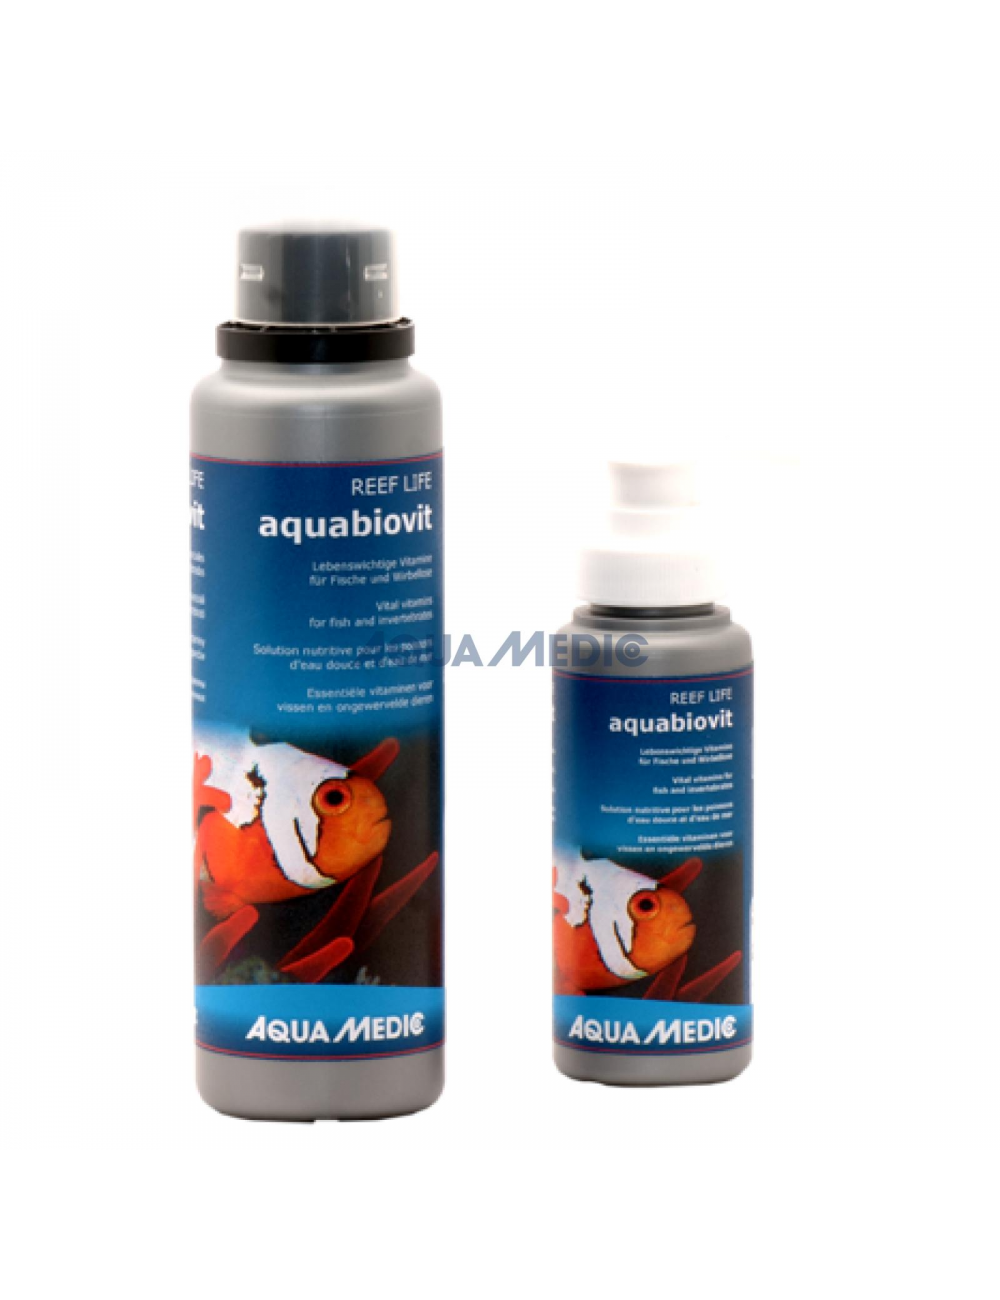 AQUA-MEDIC - REEF LIFE Aquabiovit - 250ml